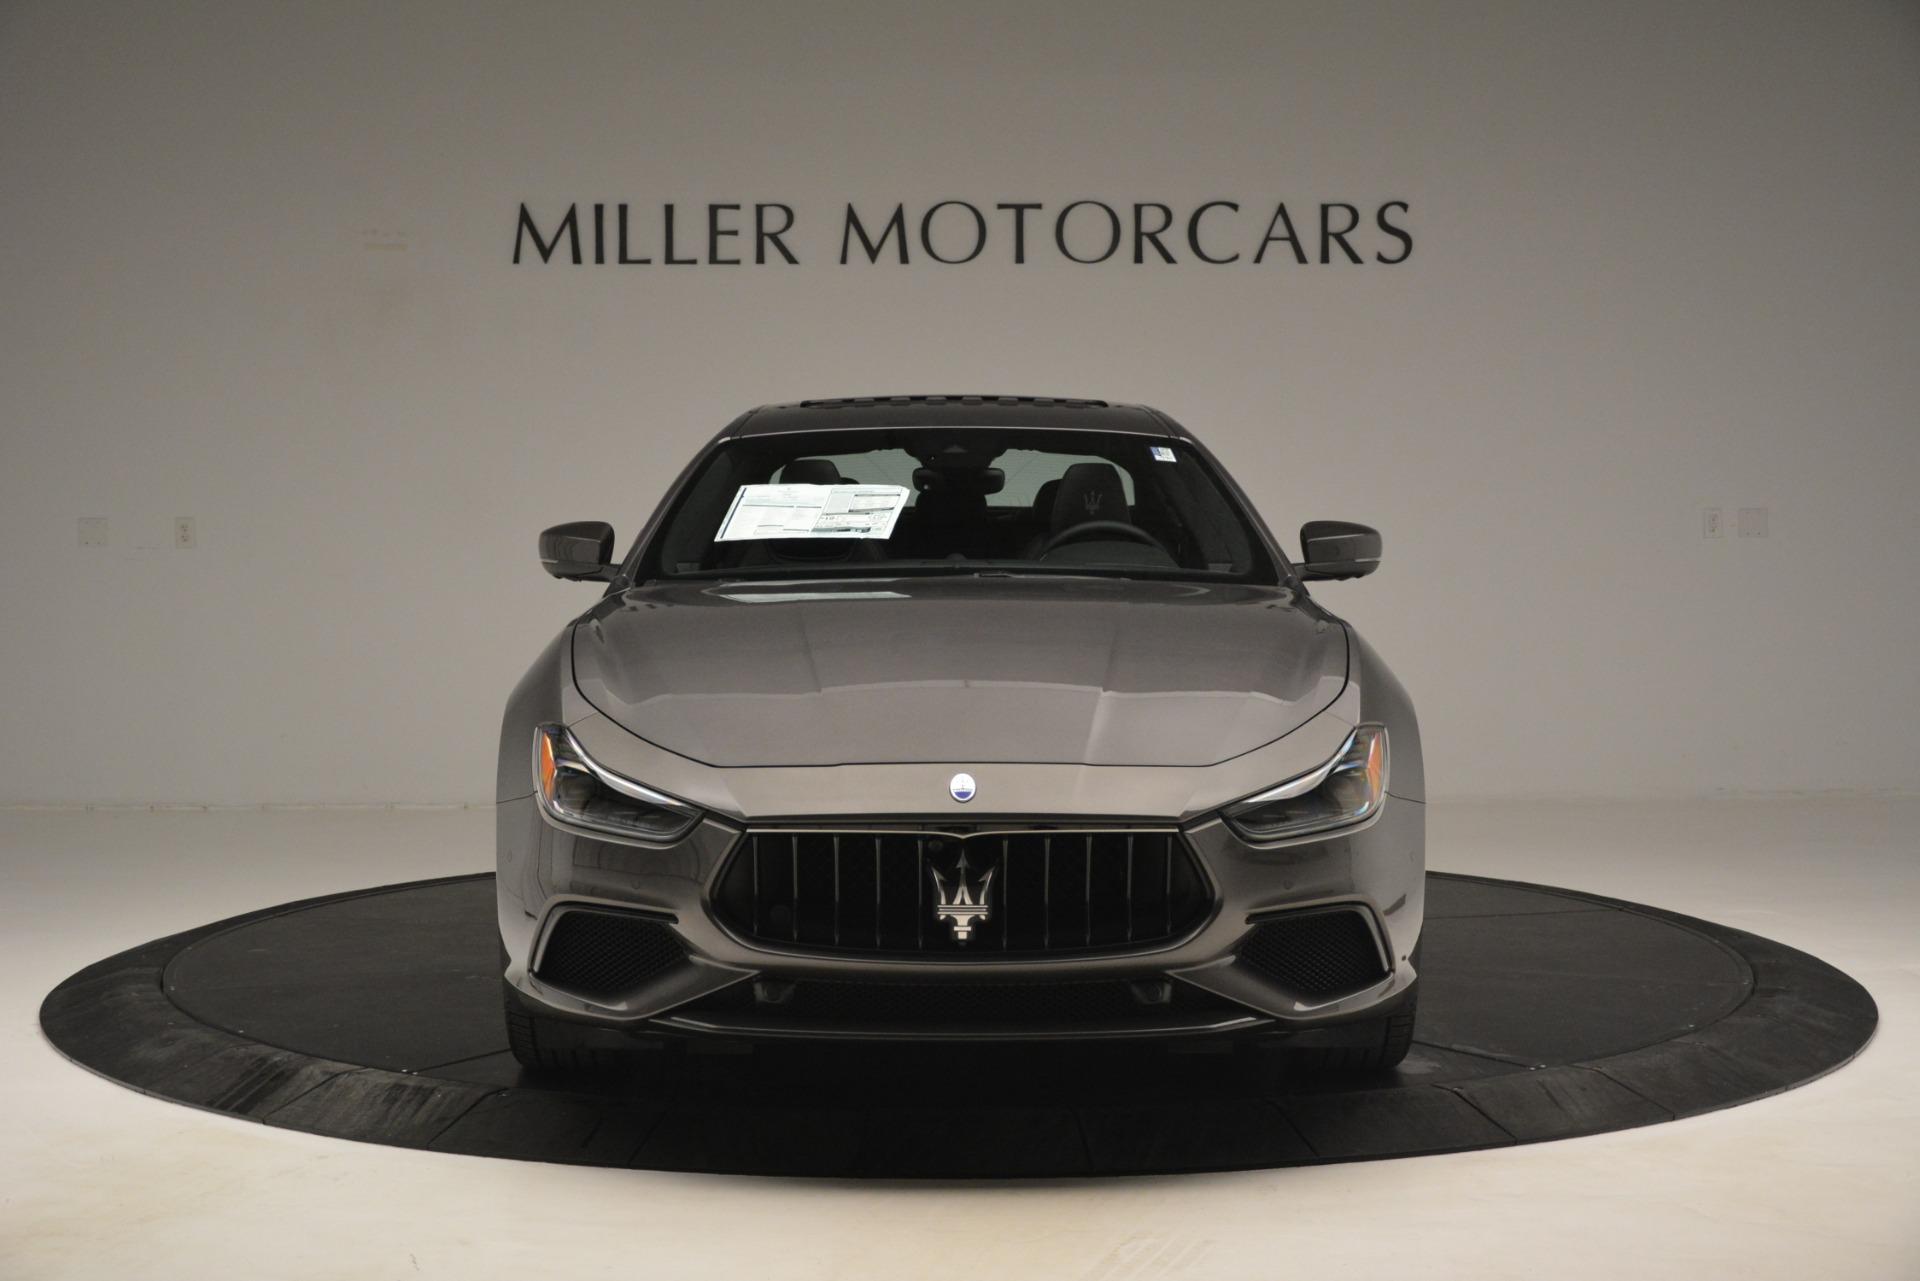 New 2019 Maserati Ghibli S Q4 GranSport For Sale In Westport, CT 2925_p13